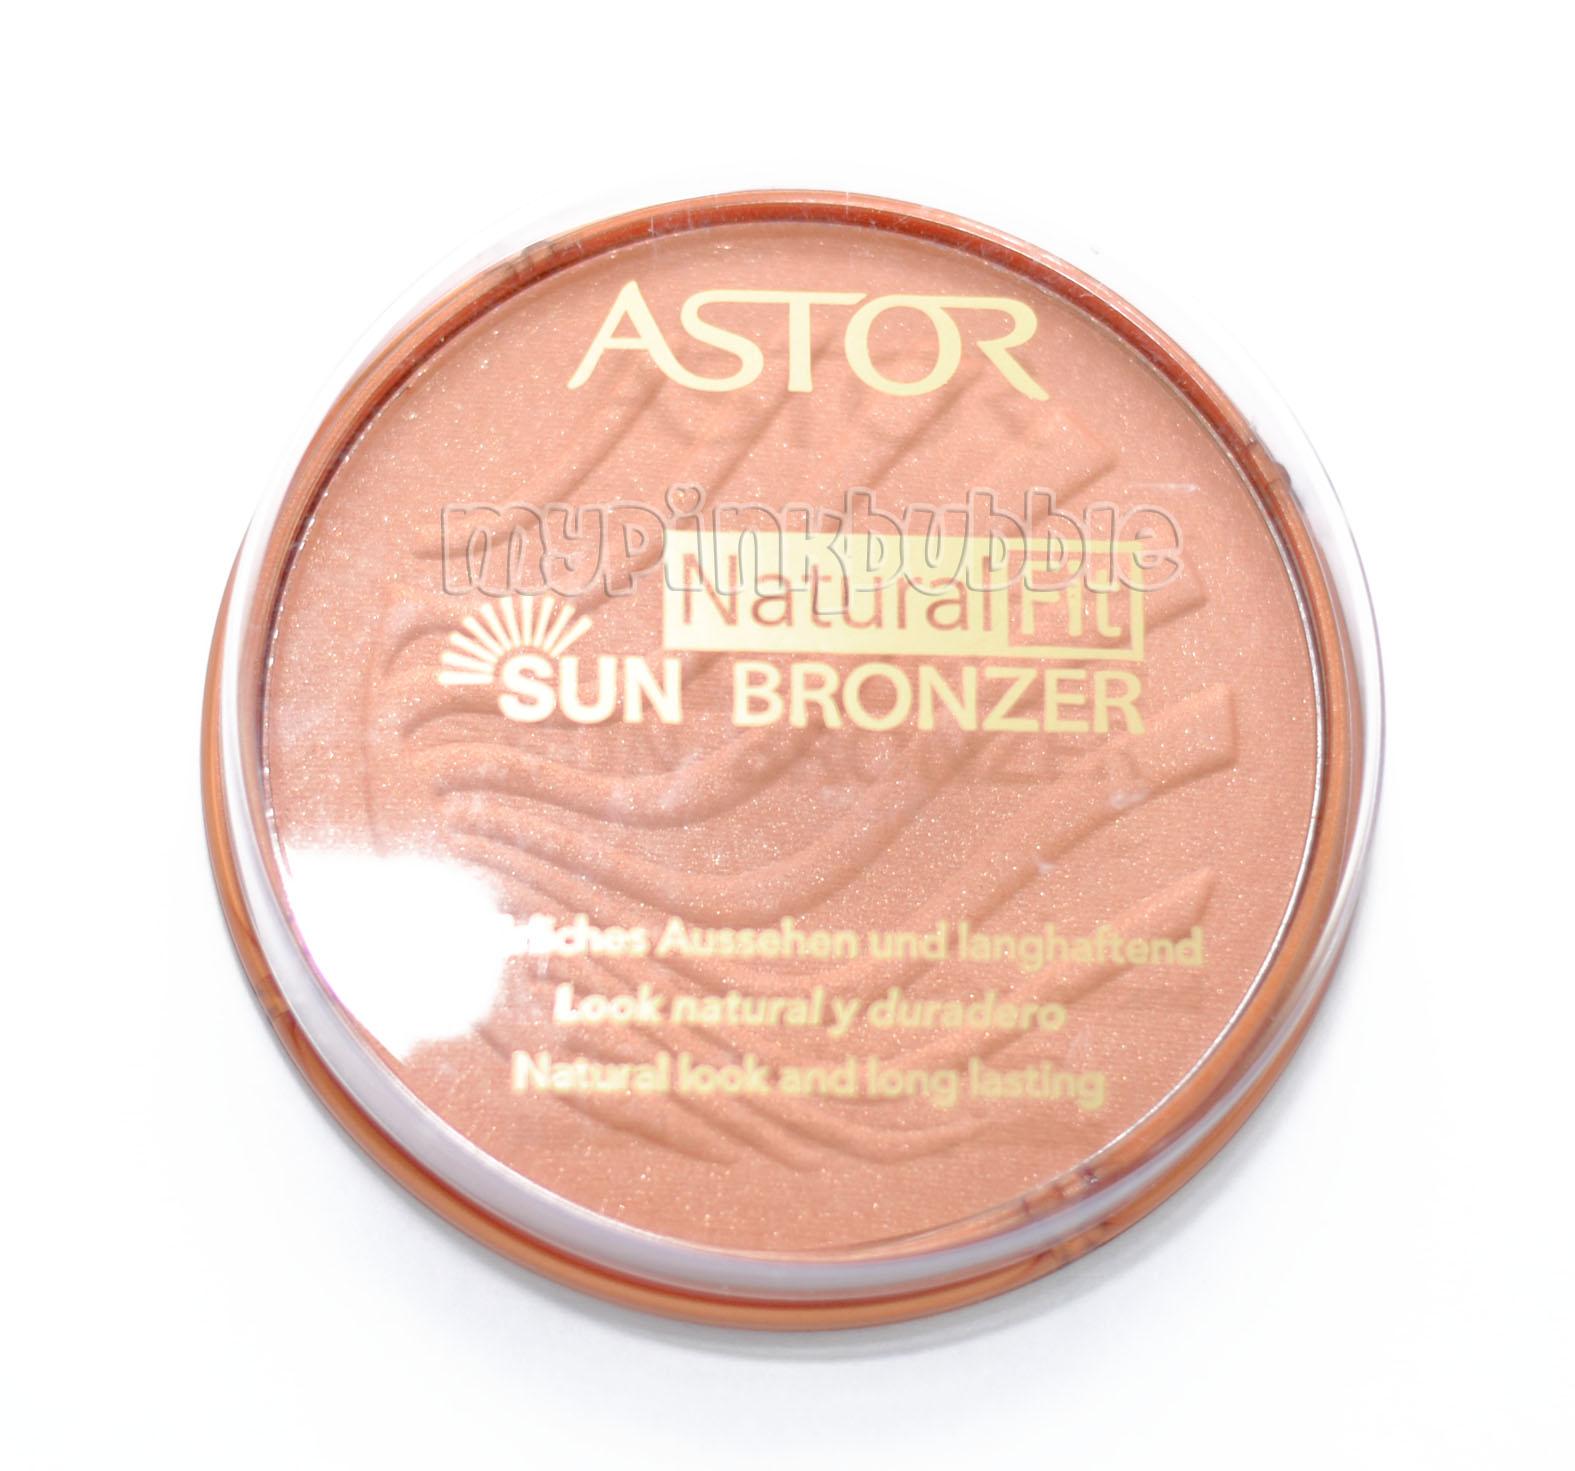 Astor sun bronzer 002 sunny sand